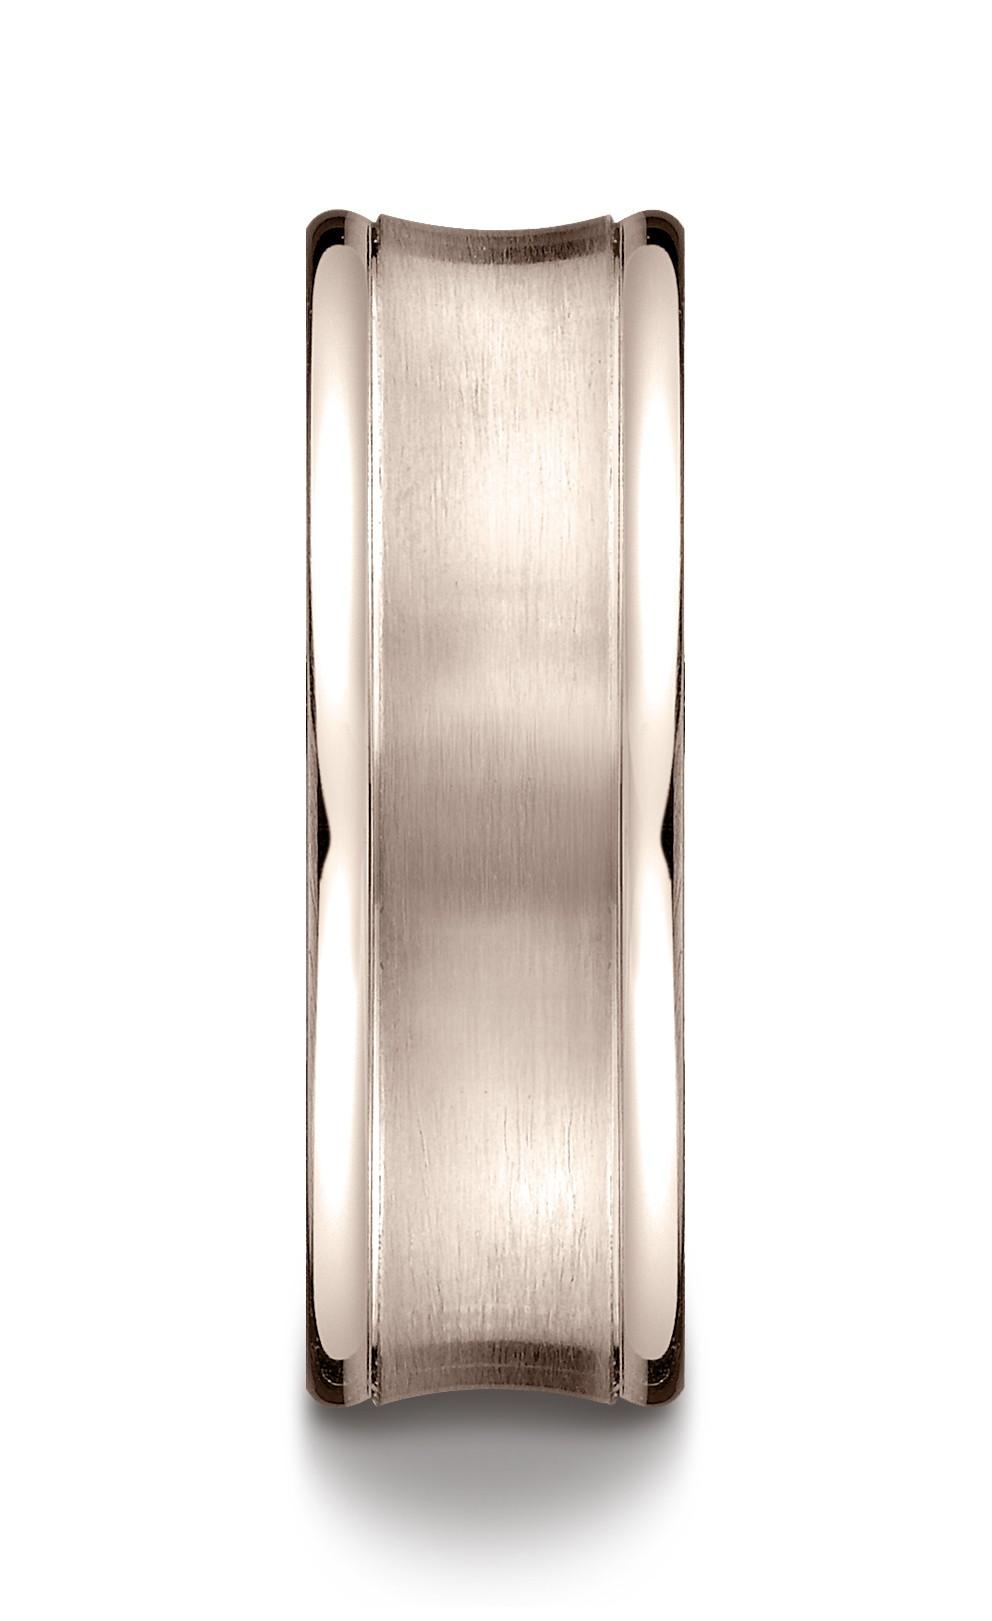 14k Rose Gold 7.5mm Comfort-fit Satin-finished Concave Round Edge Carved Design Band